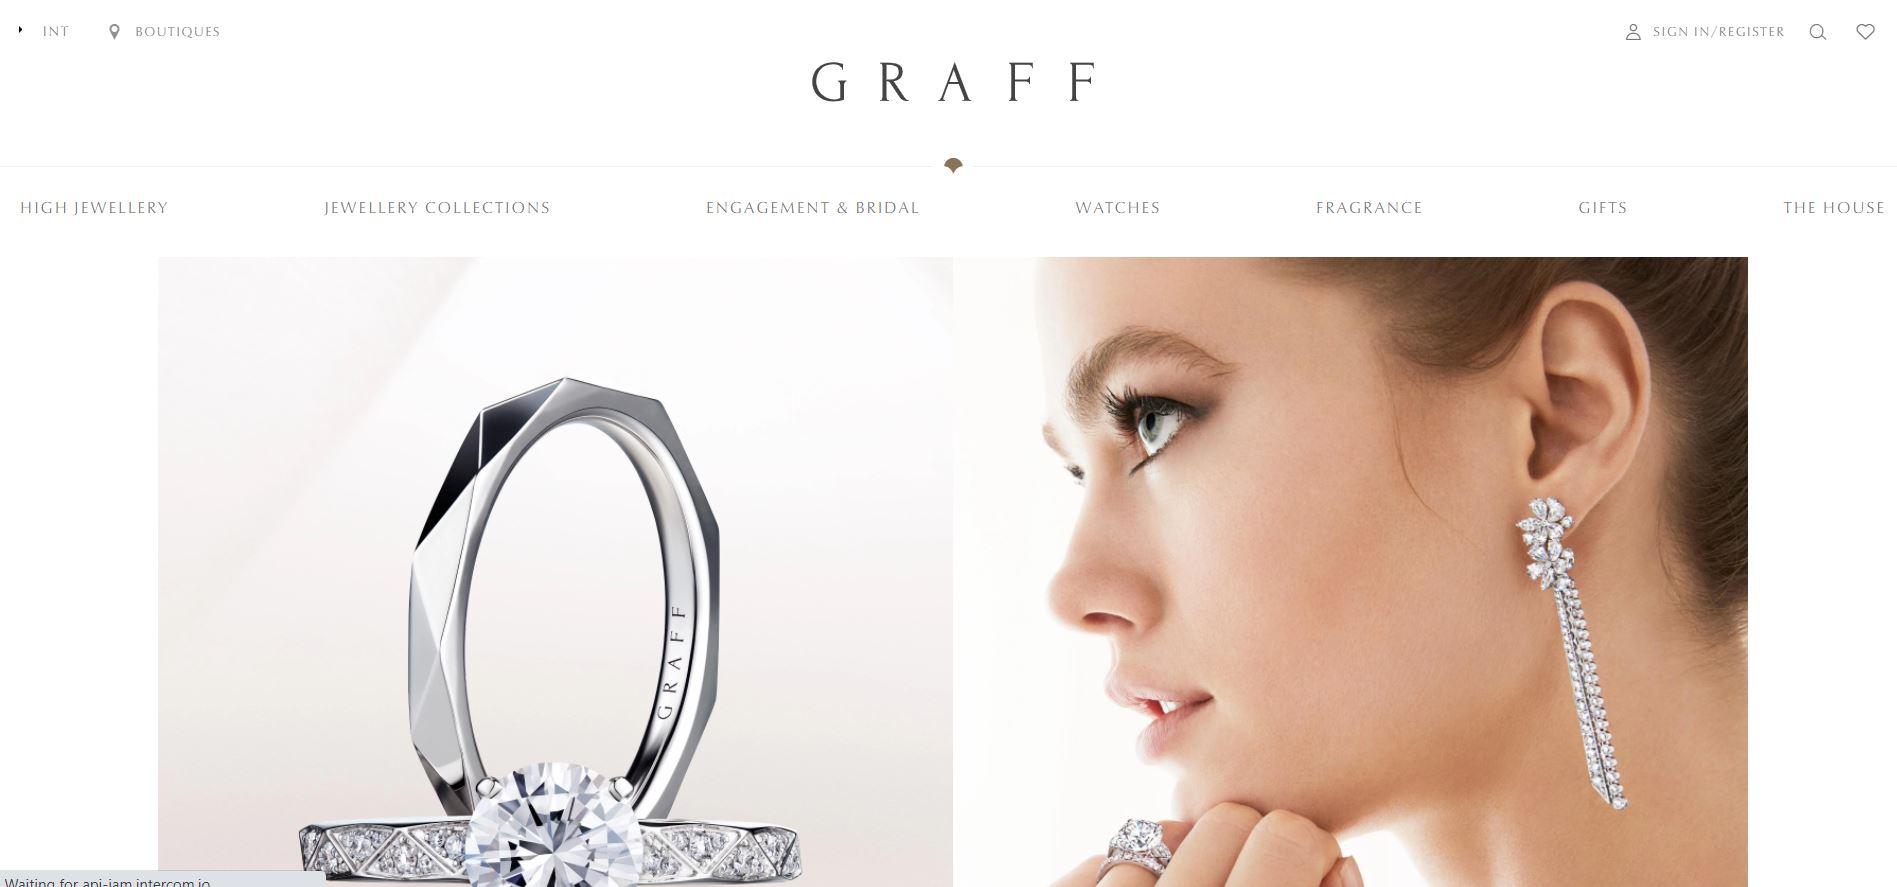 Graff Diamonds is British multinational jewellery